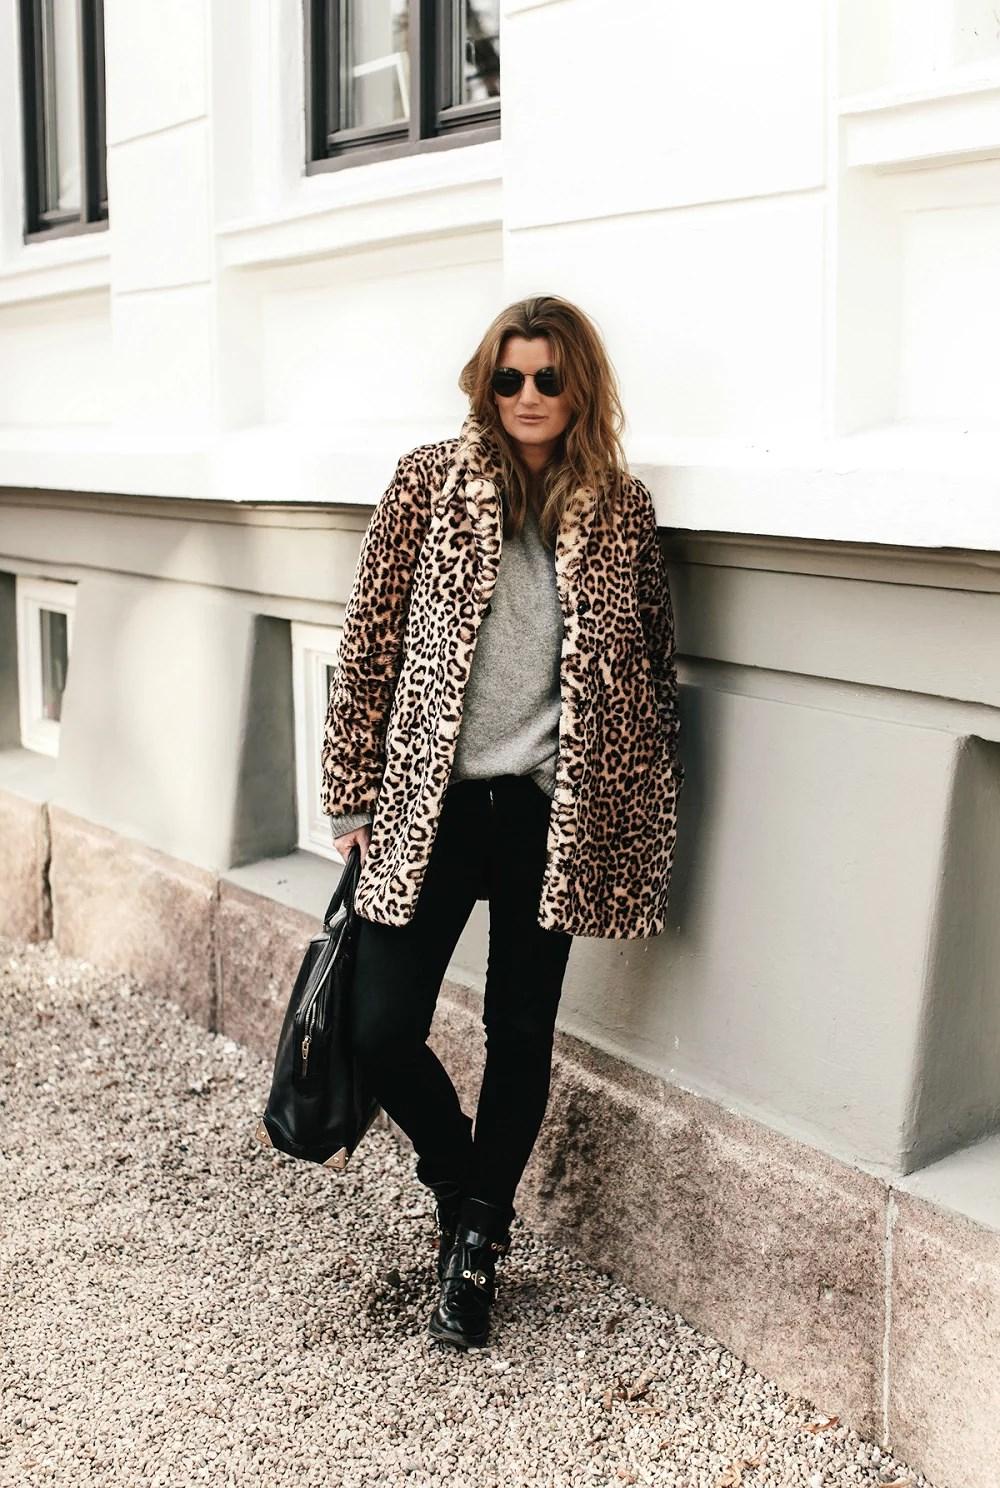 Lilisfashion Line Kirkhus moteblogger stylist fashion blog lifestyle norway paris minimum copenhagen london new yort street style